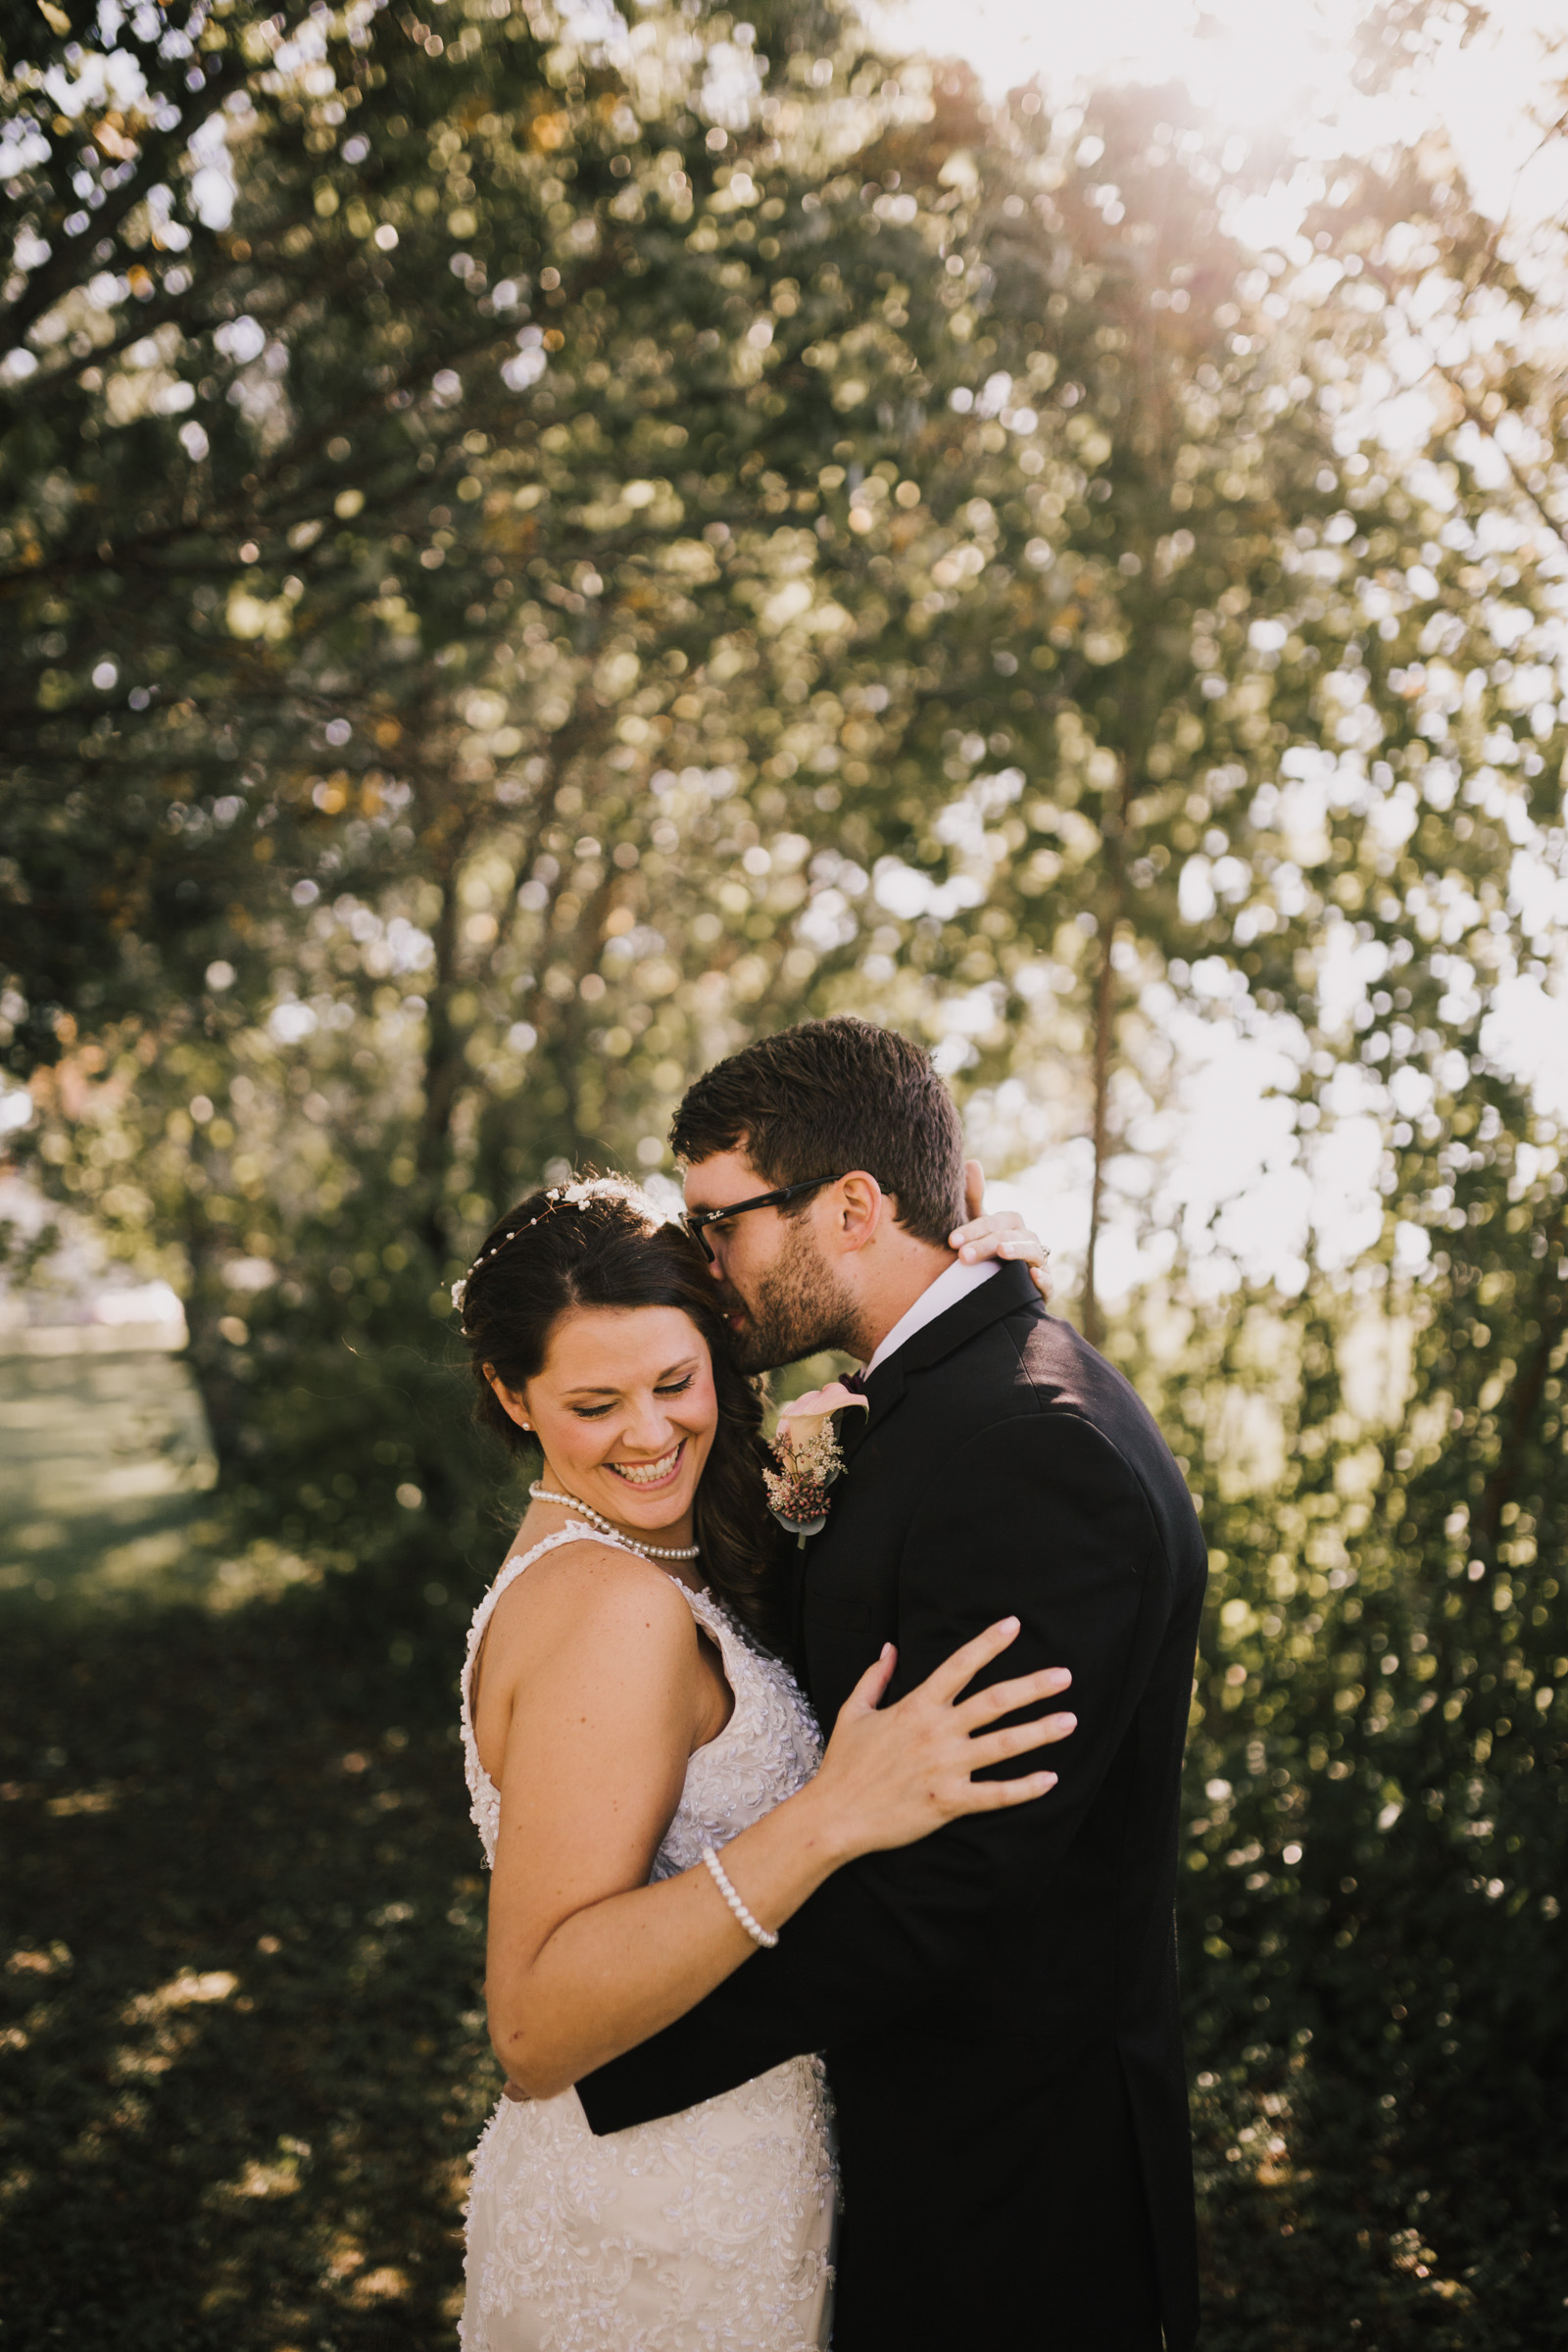 alyssa barletter photography intimate fall autumn wedding rural missouri wedding photographer-25.jpg